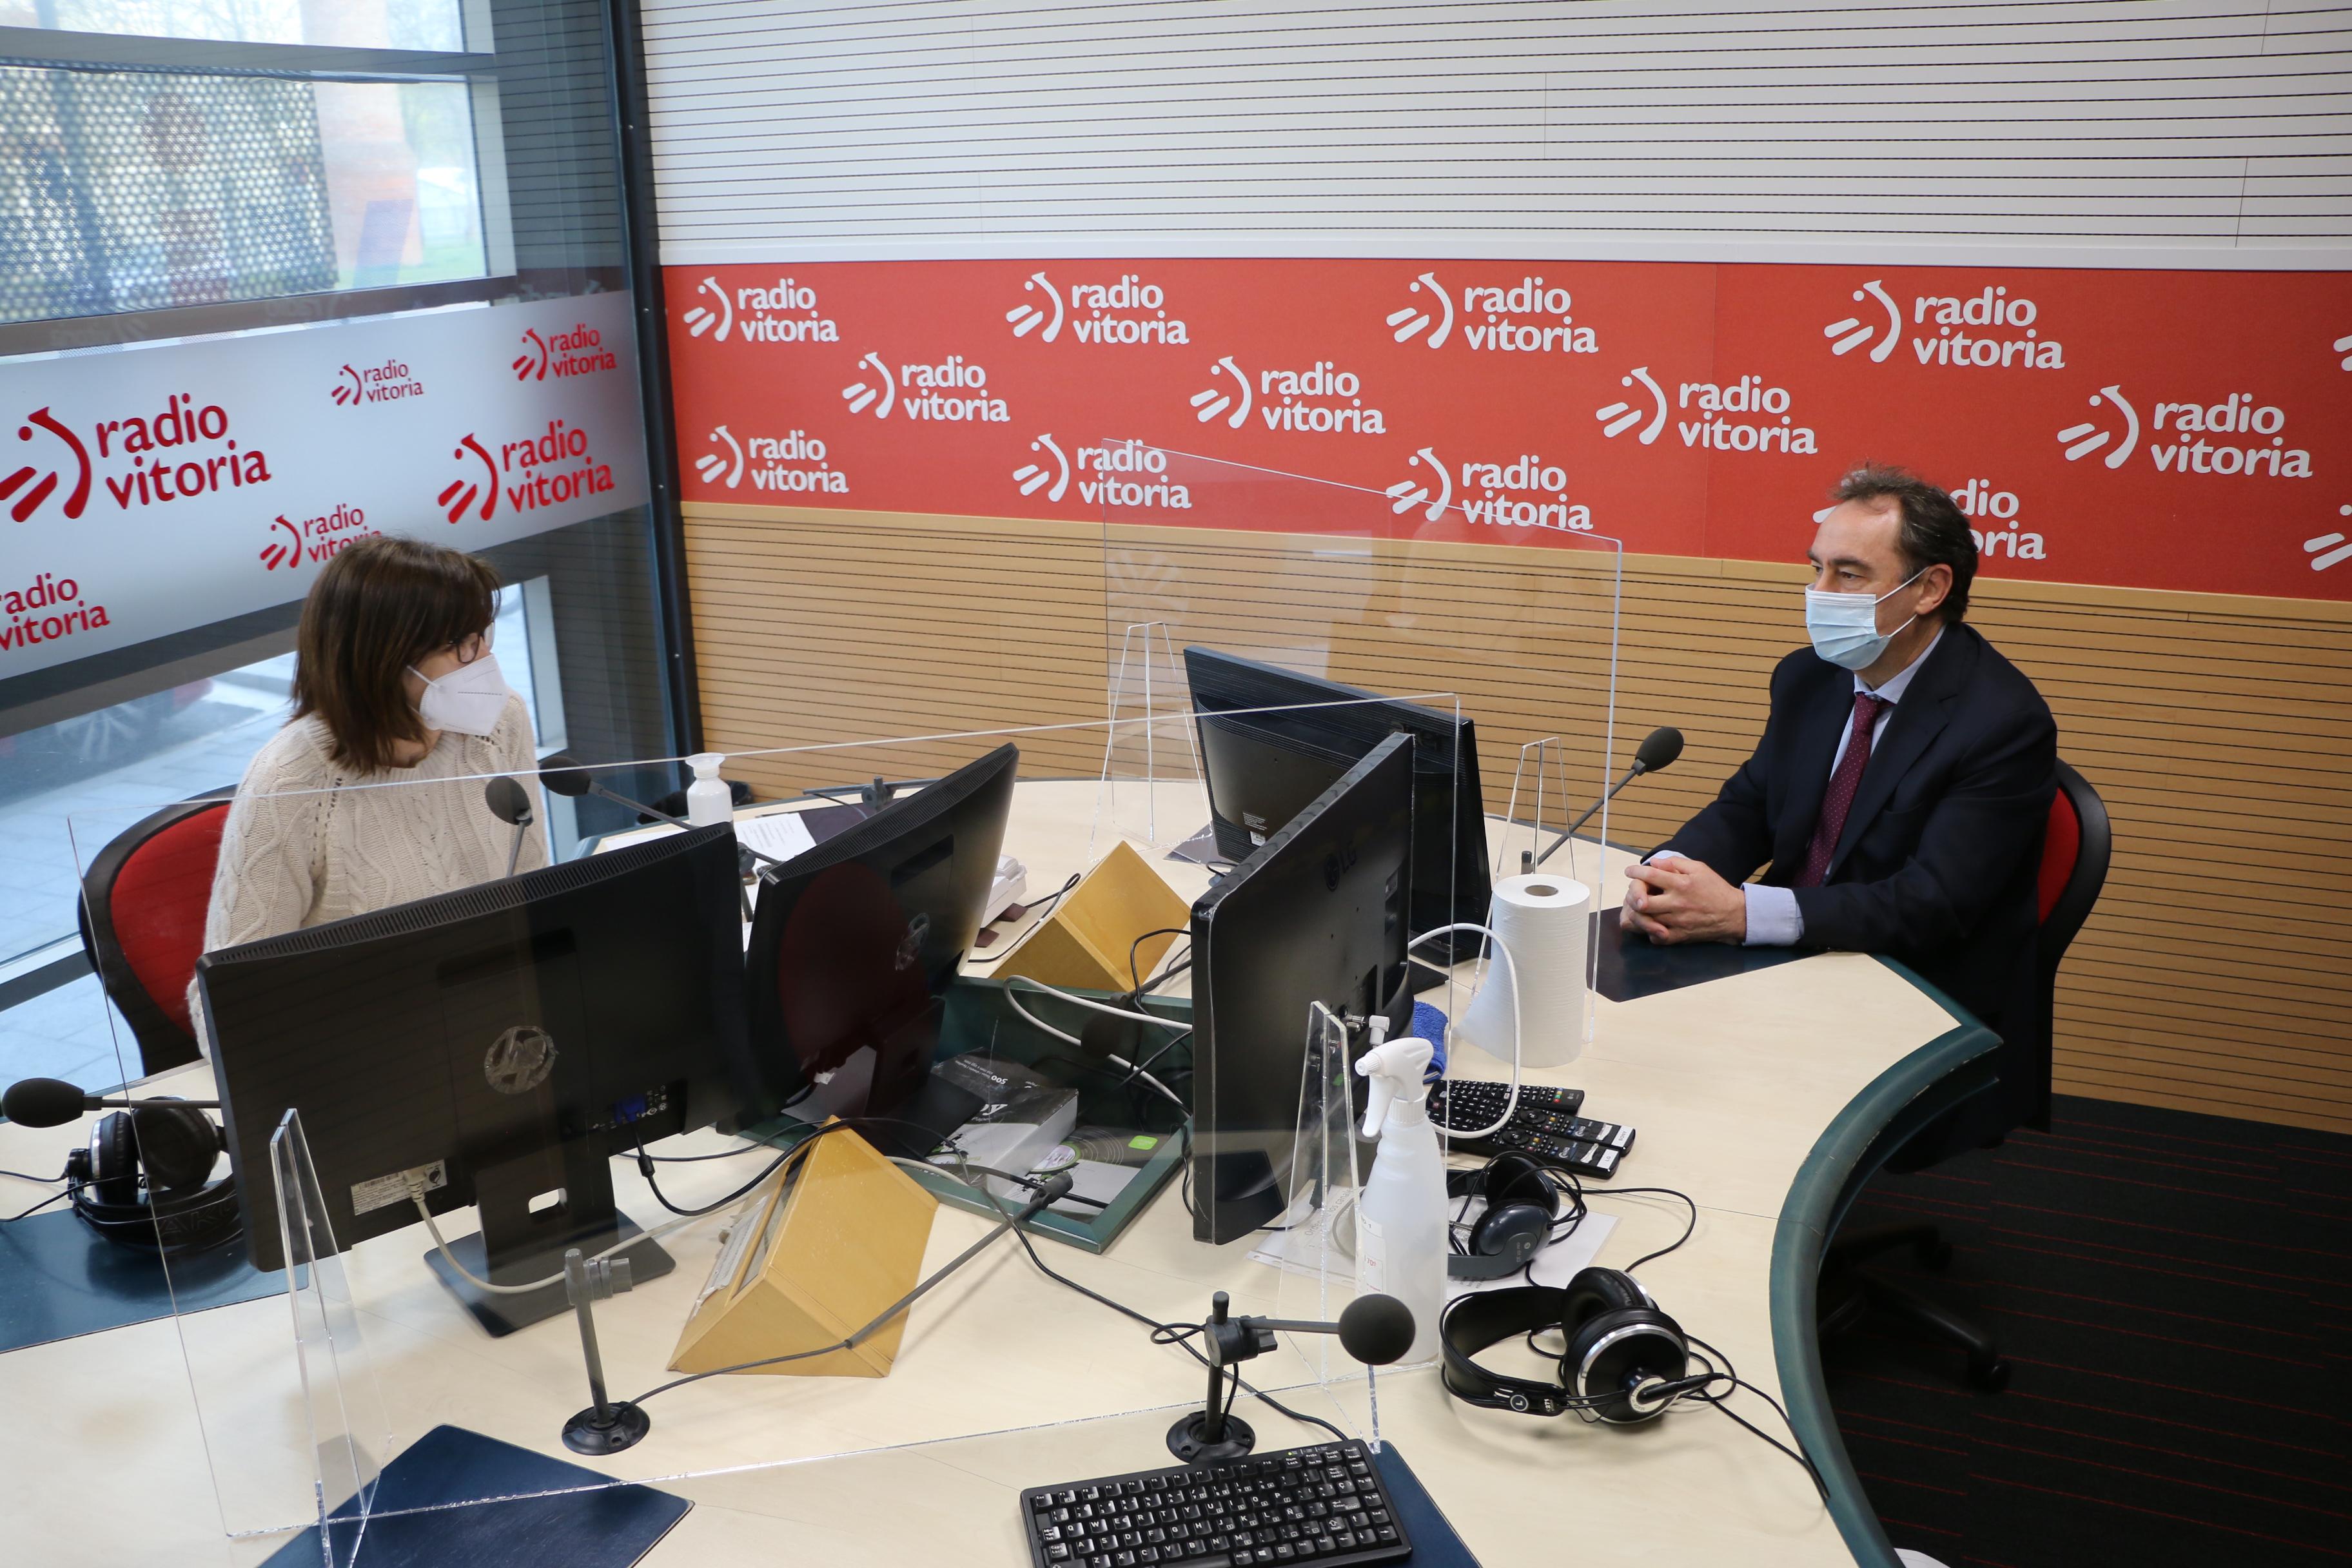 Antonio_aiz_radio_vitoria.JPG